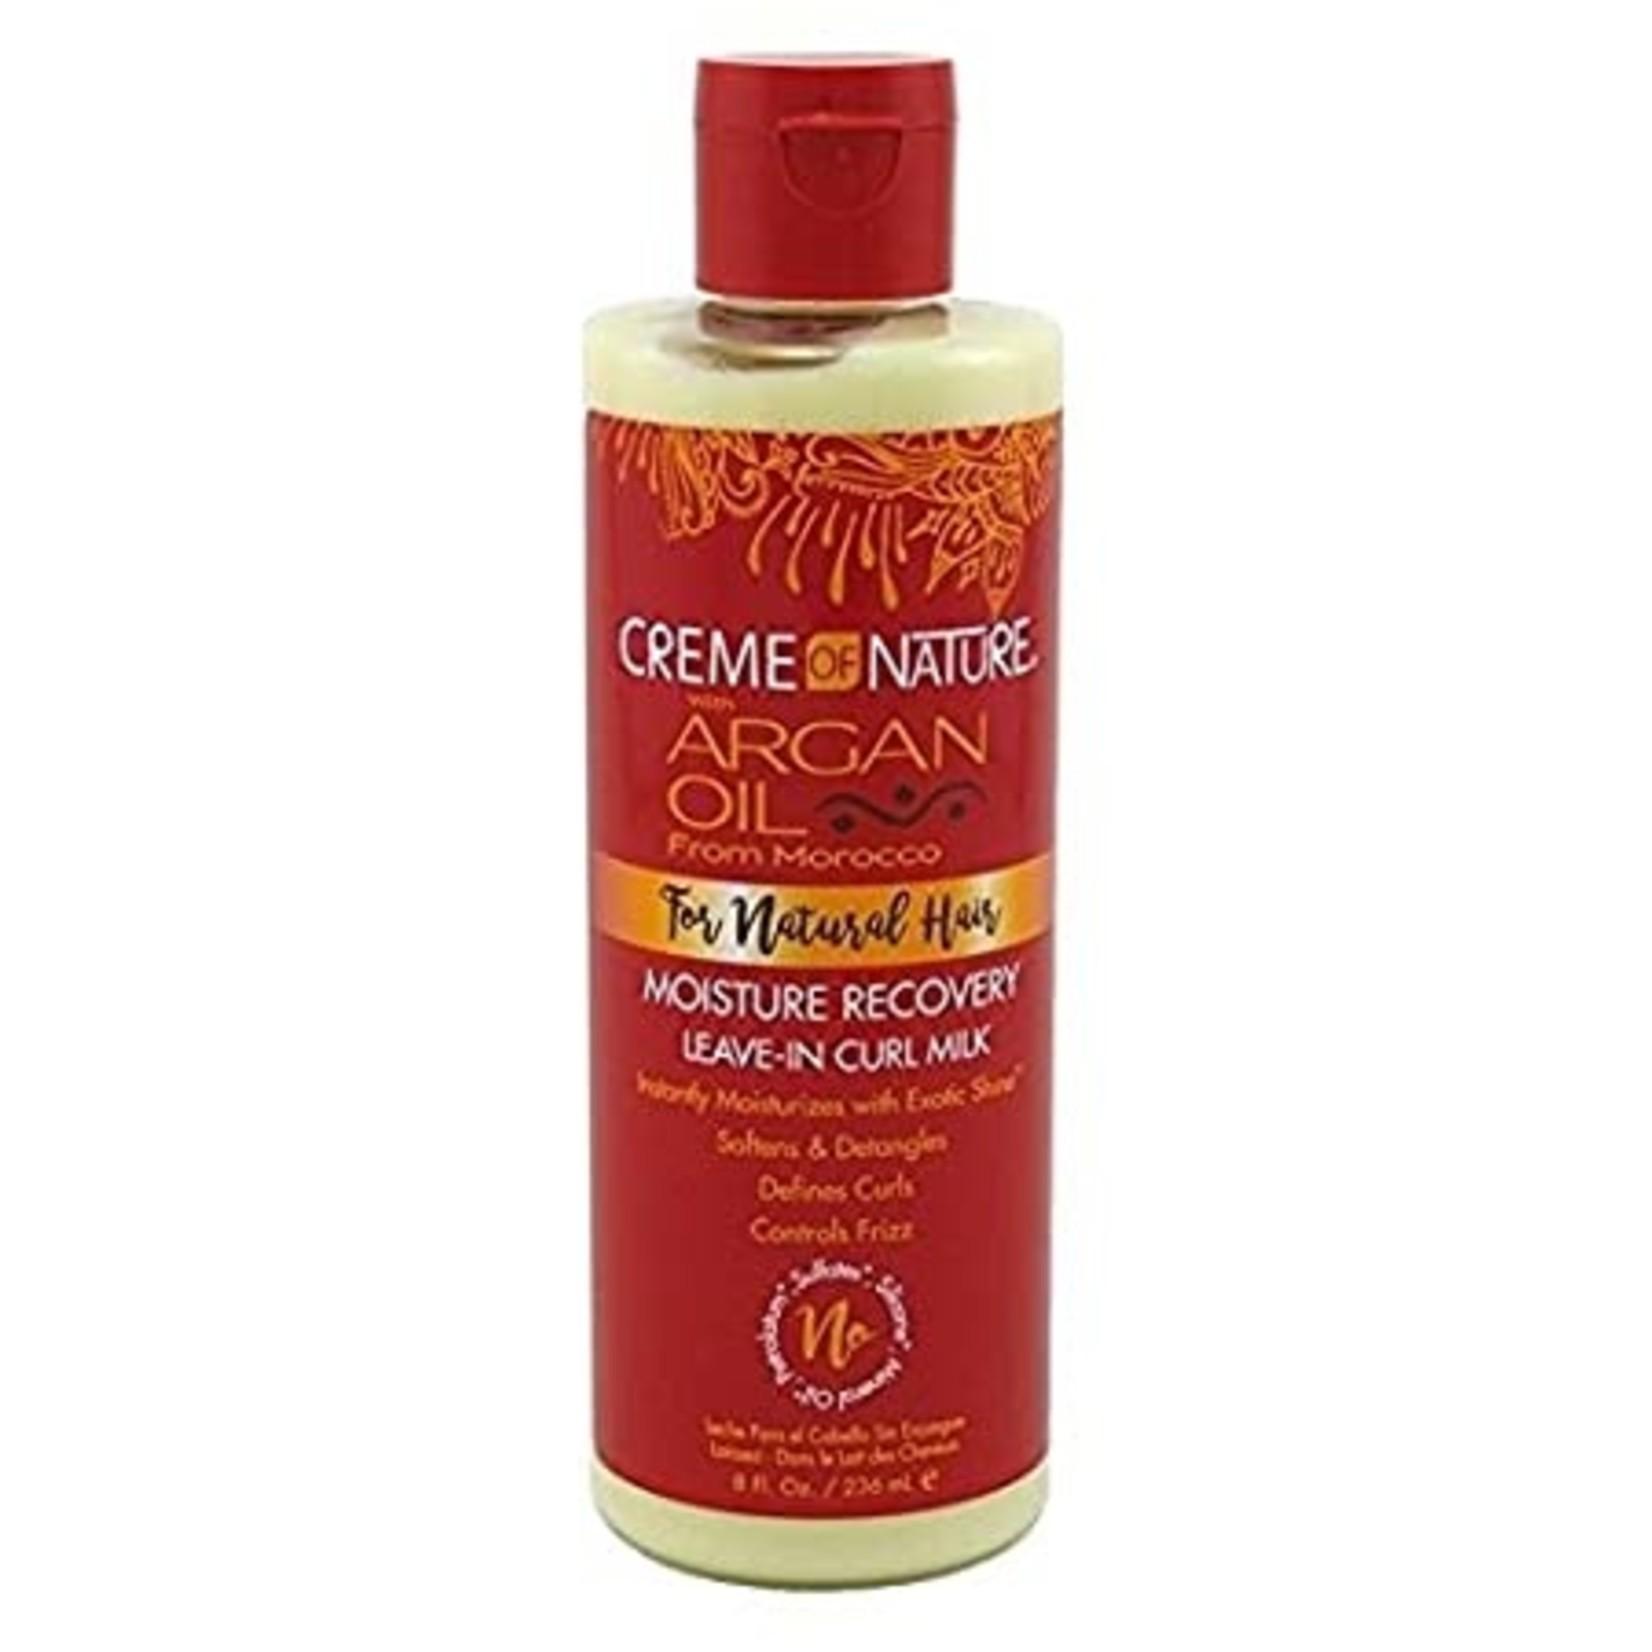 Creme of Nature Argan Oil Leave-In Curl Milk